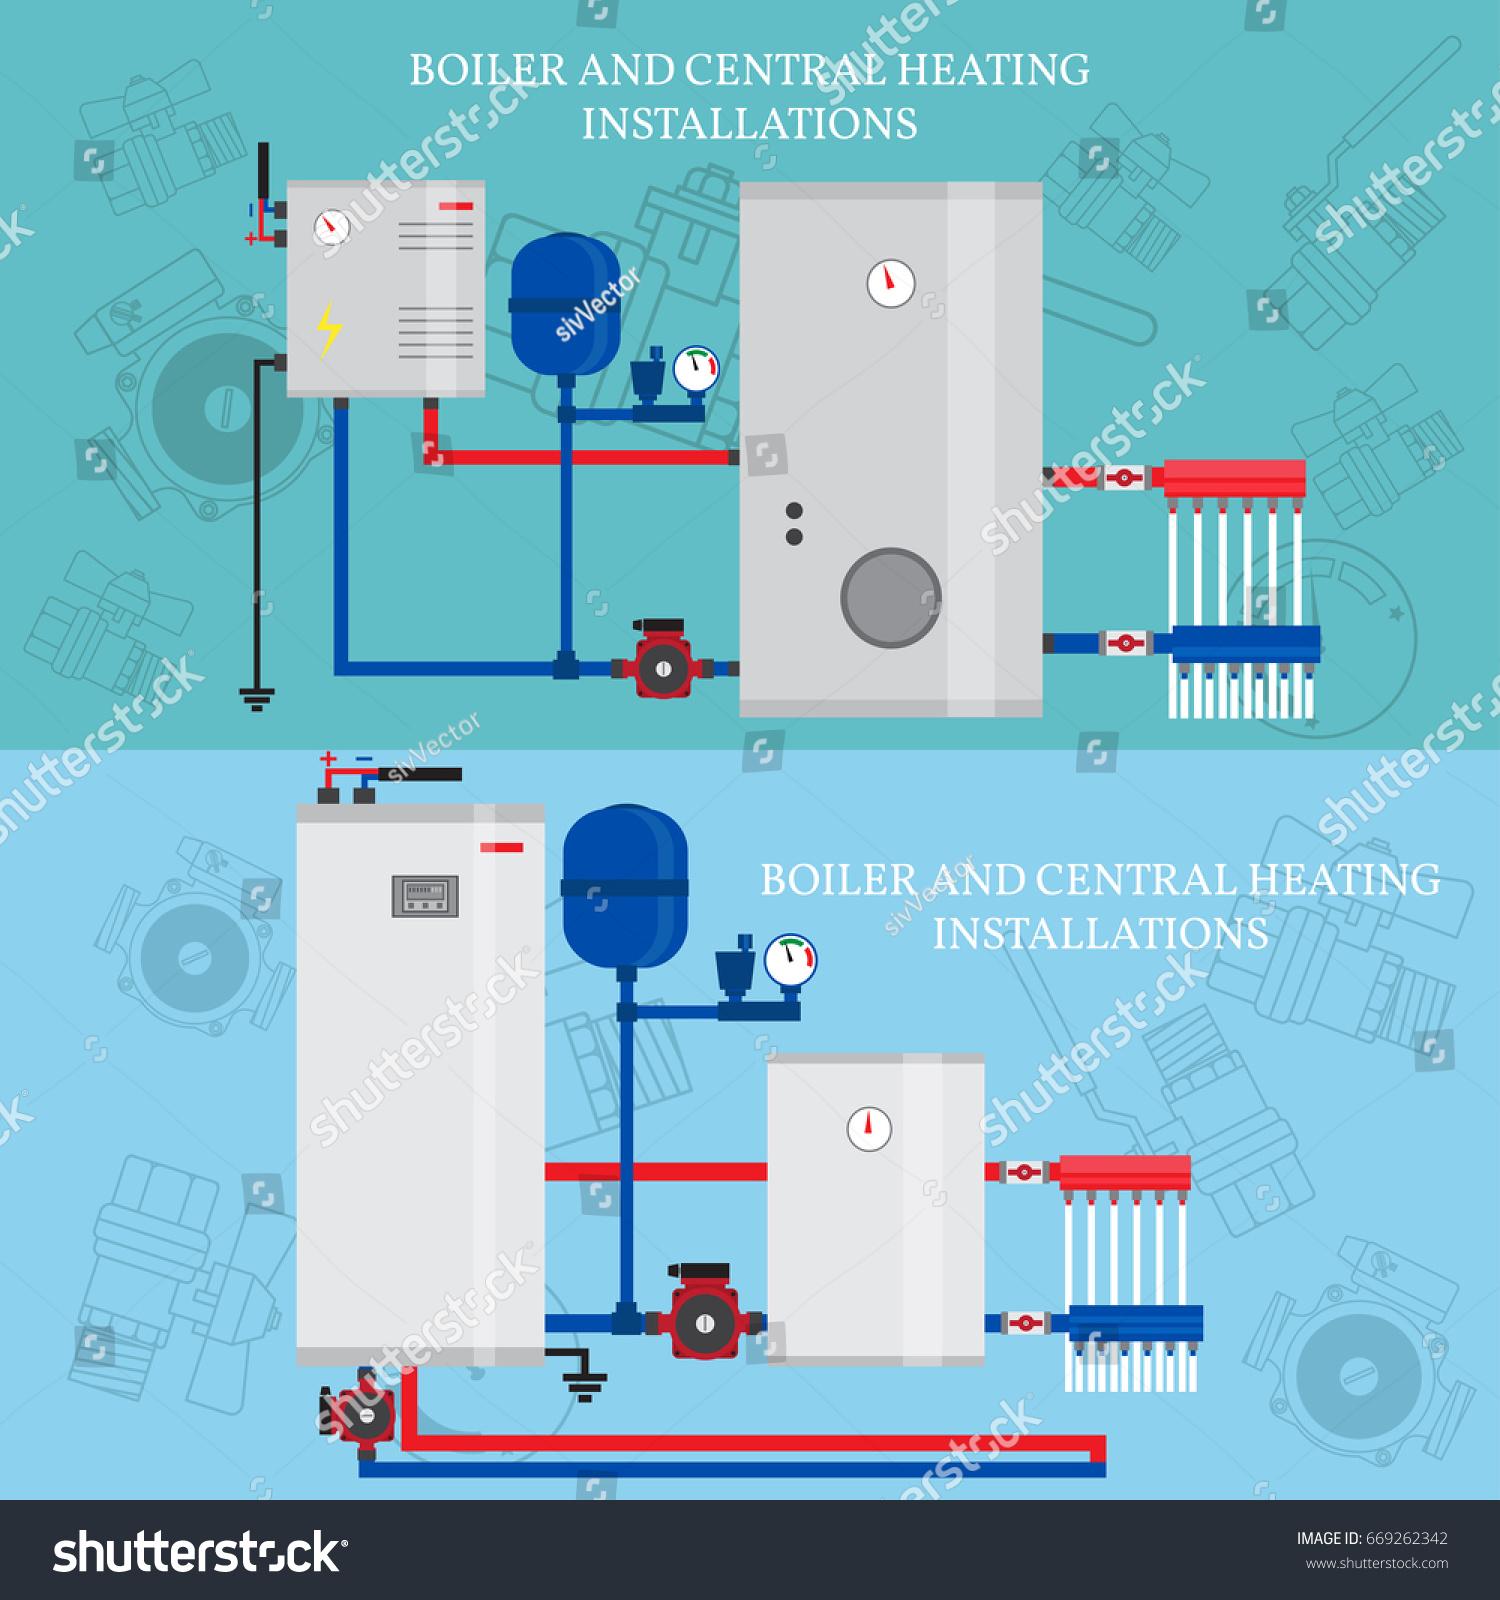 Boiler Central Heating Installations Flat Heating Stock Vector ...